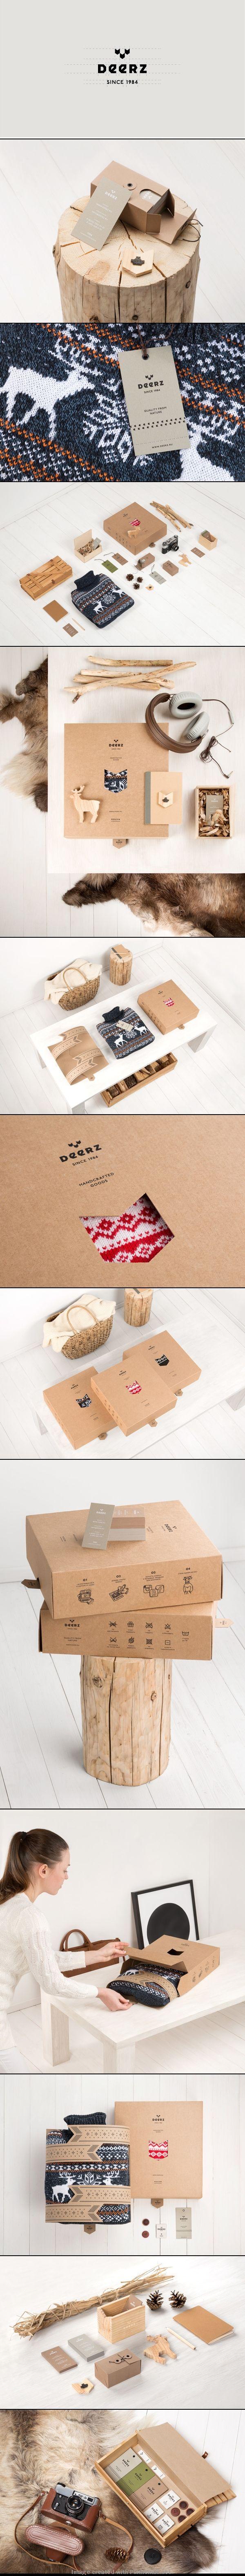 Deerz | #logo #stationary #corporate #design #corporatedesign #identity #branding